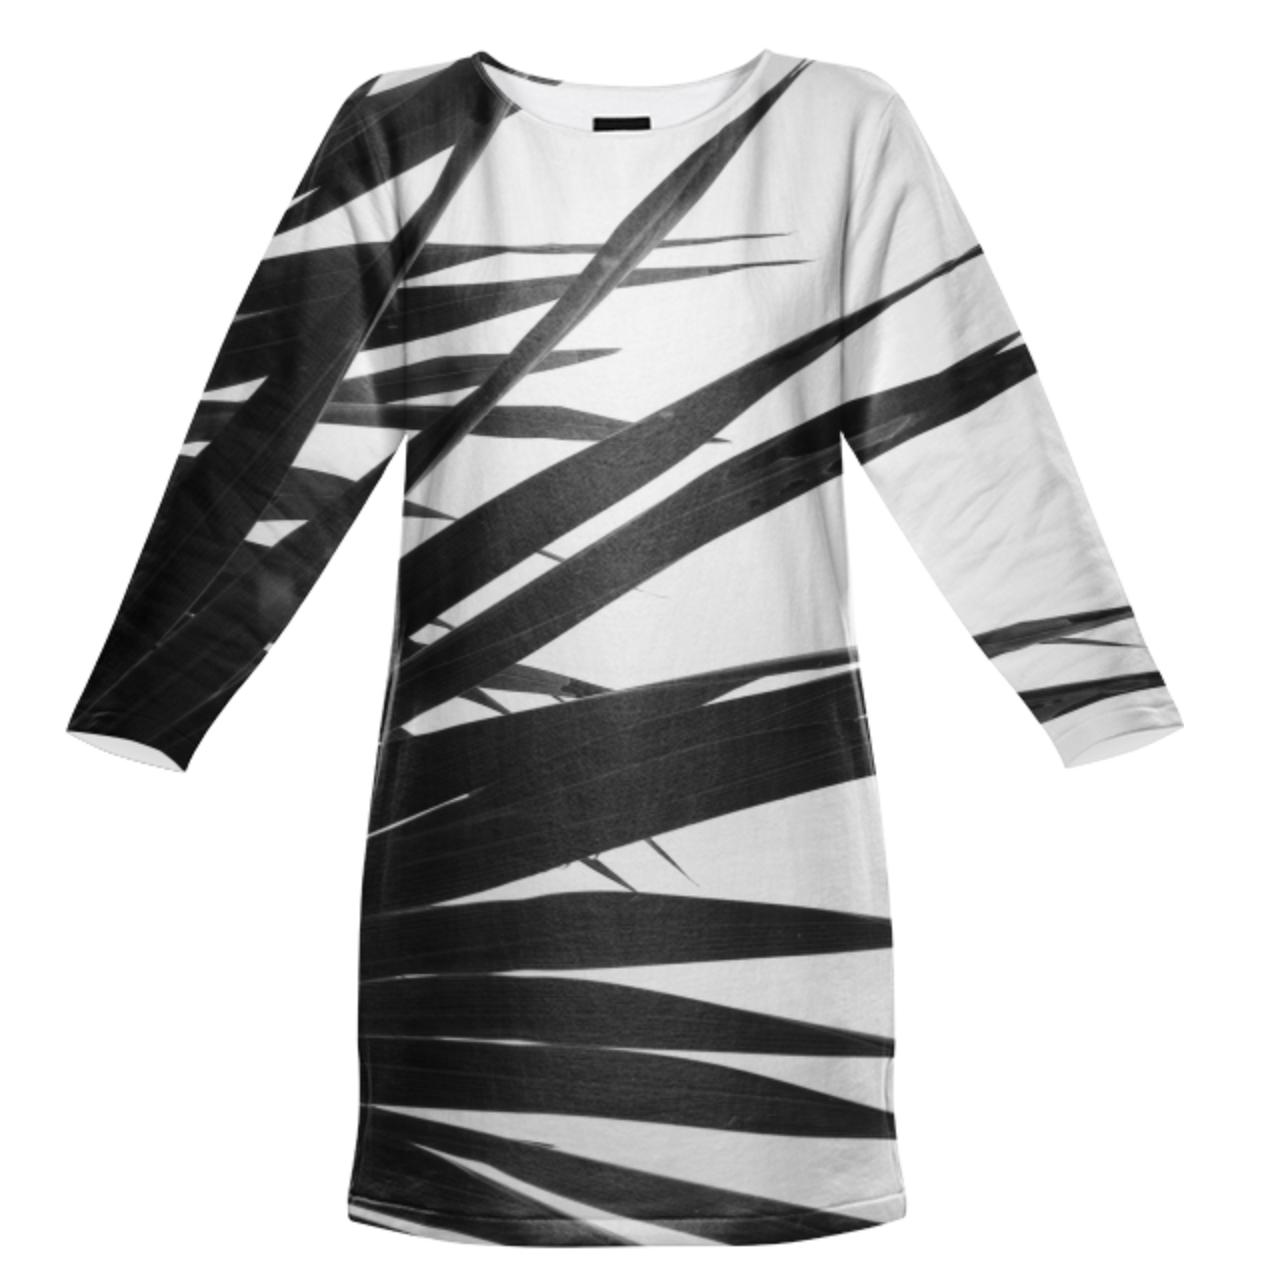 BW PALMY DRESS    Totally All Cotton Sweatshirt Dress      Ninety Five Dollars